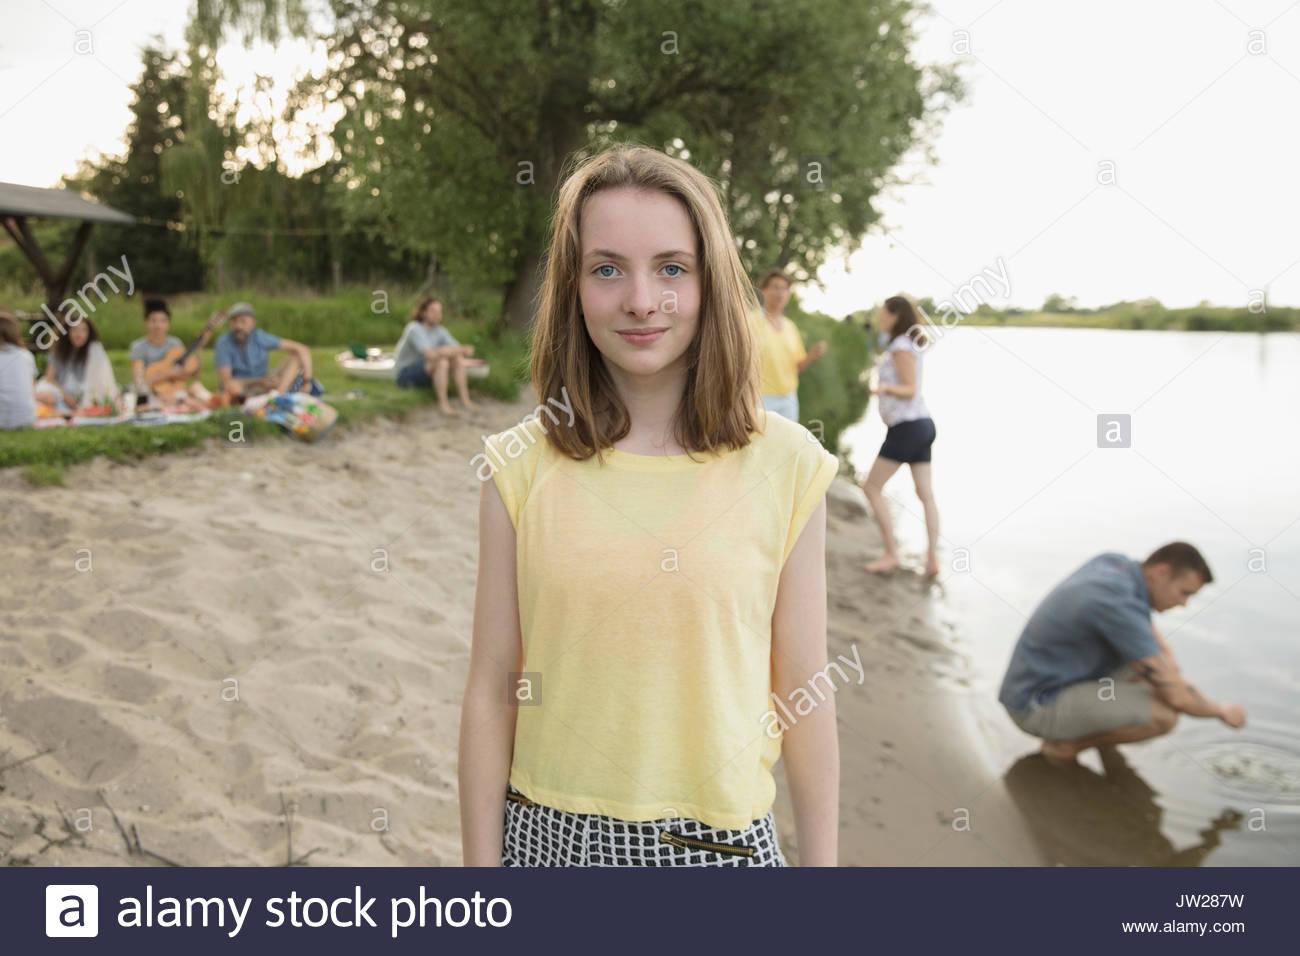 Retrato sonriente pre-adolescente en verano lakeside beach Imagen De Stock